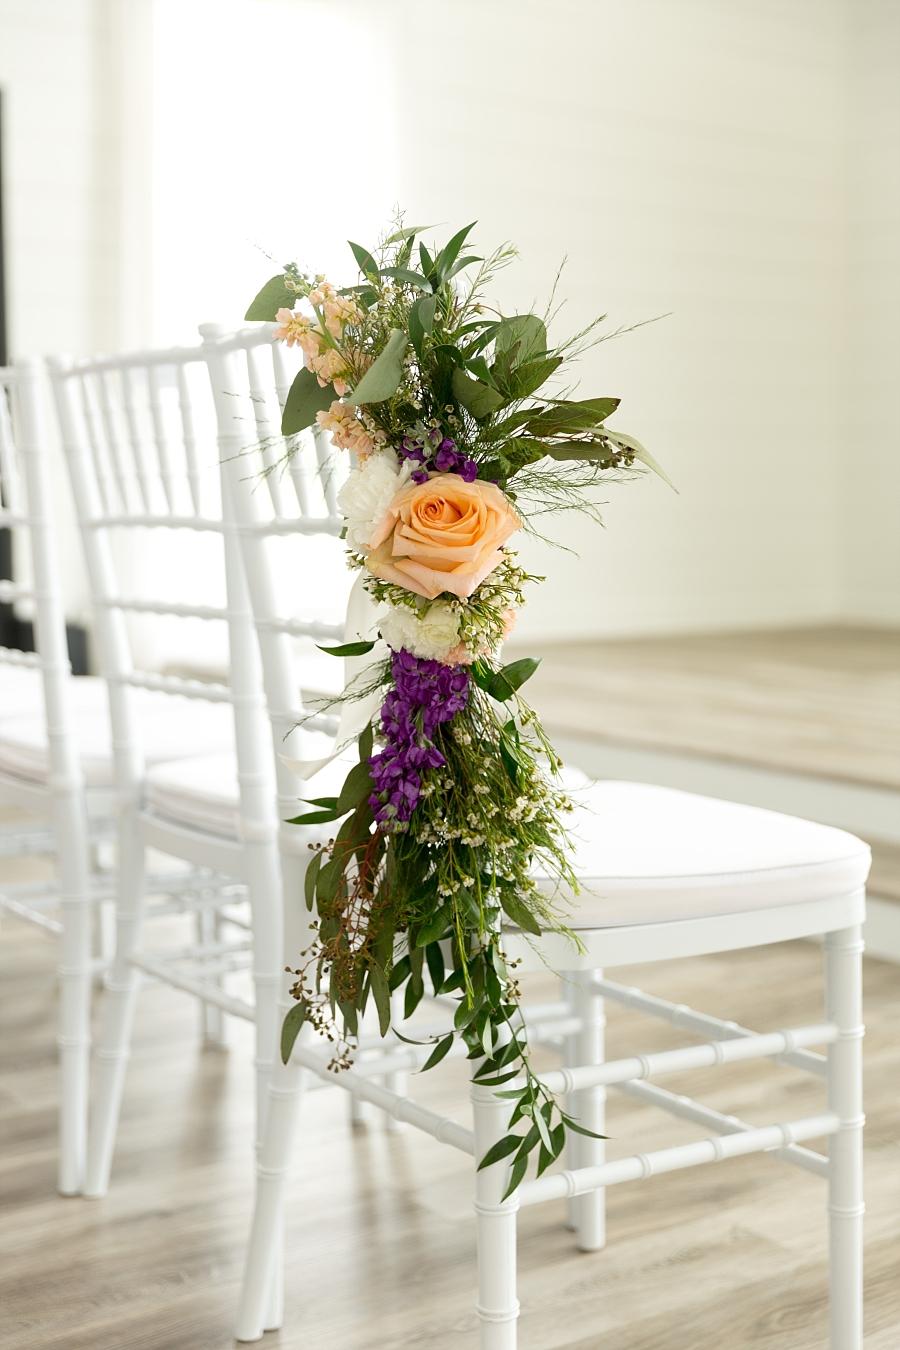 Stacy-Anderson-Photography-The-Farmhouse-Houston-Wedding-Photographer_0120.jpg